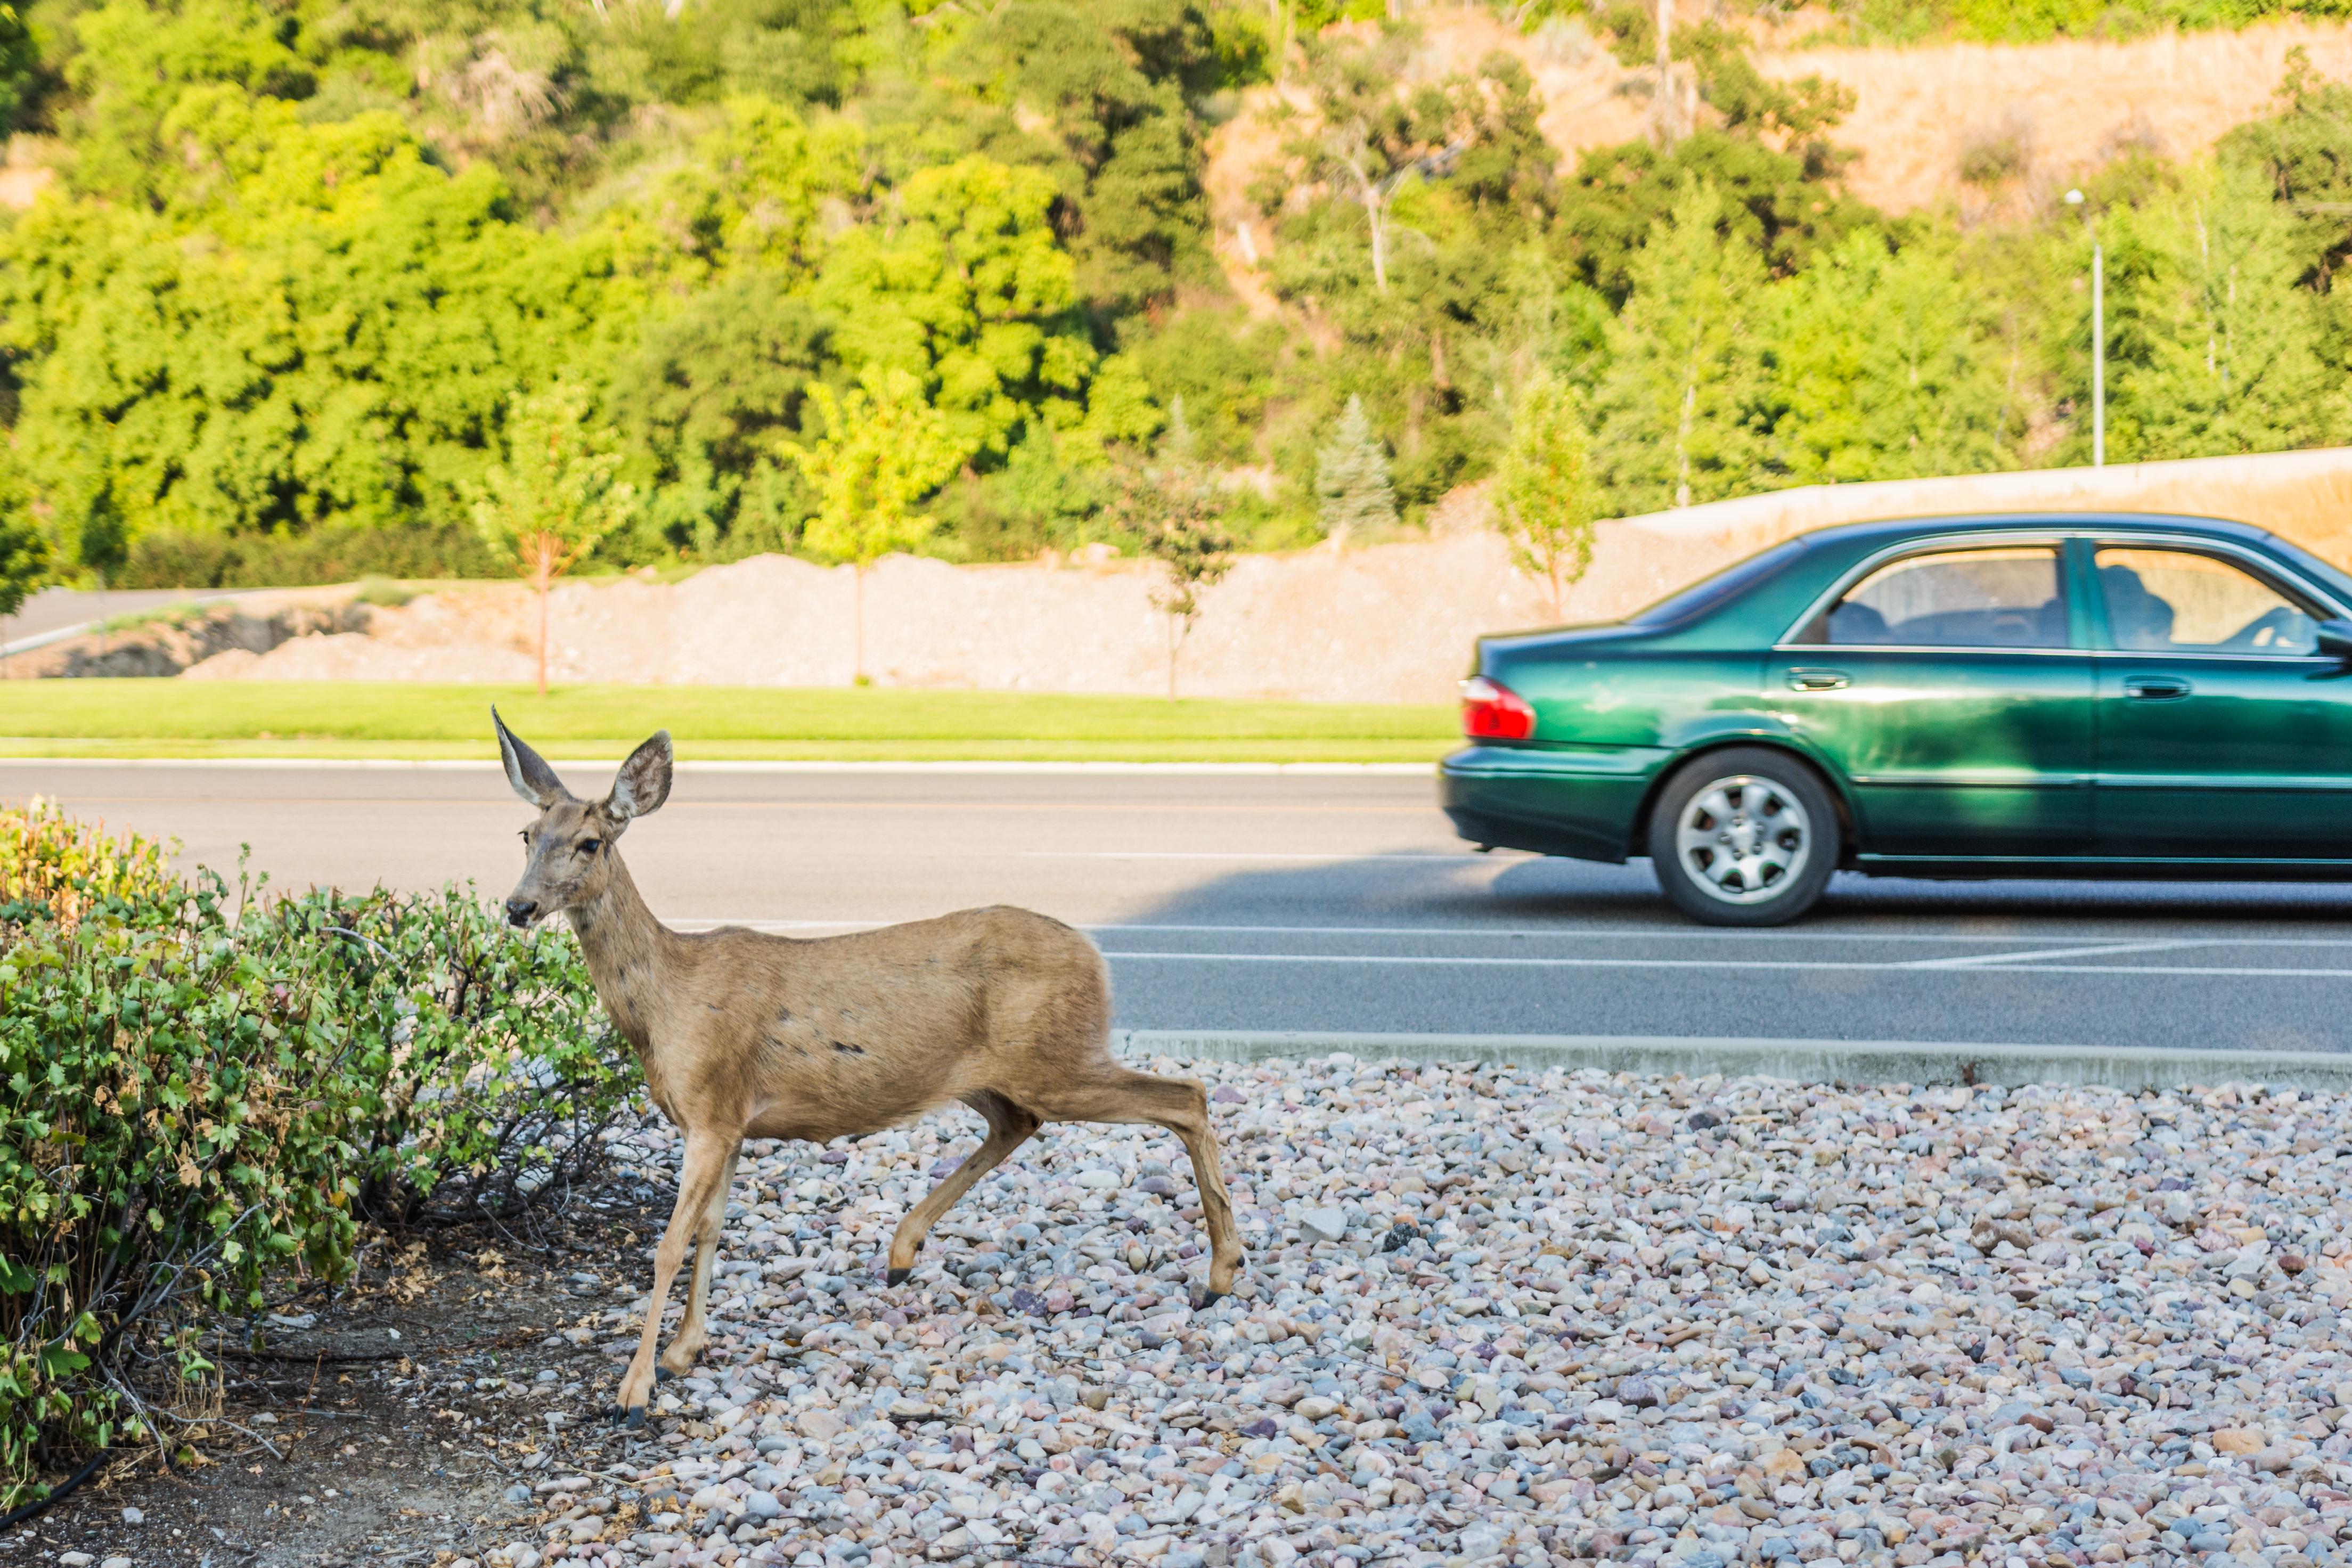 Deer running across busy road